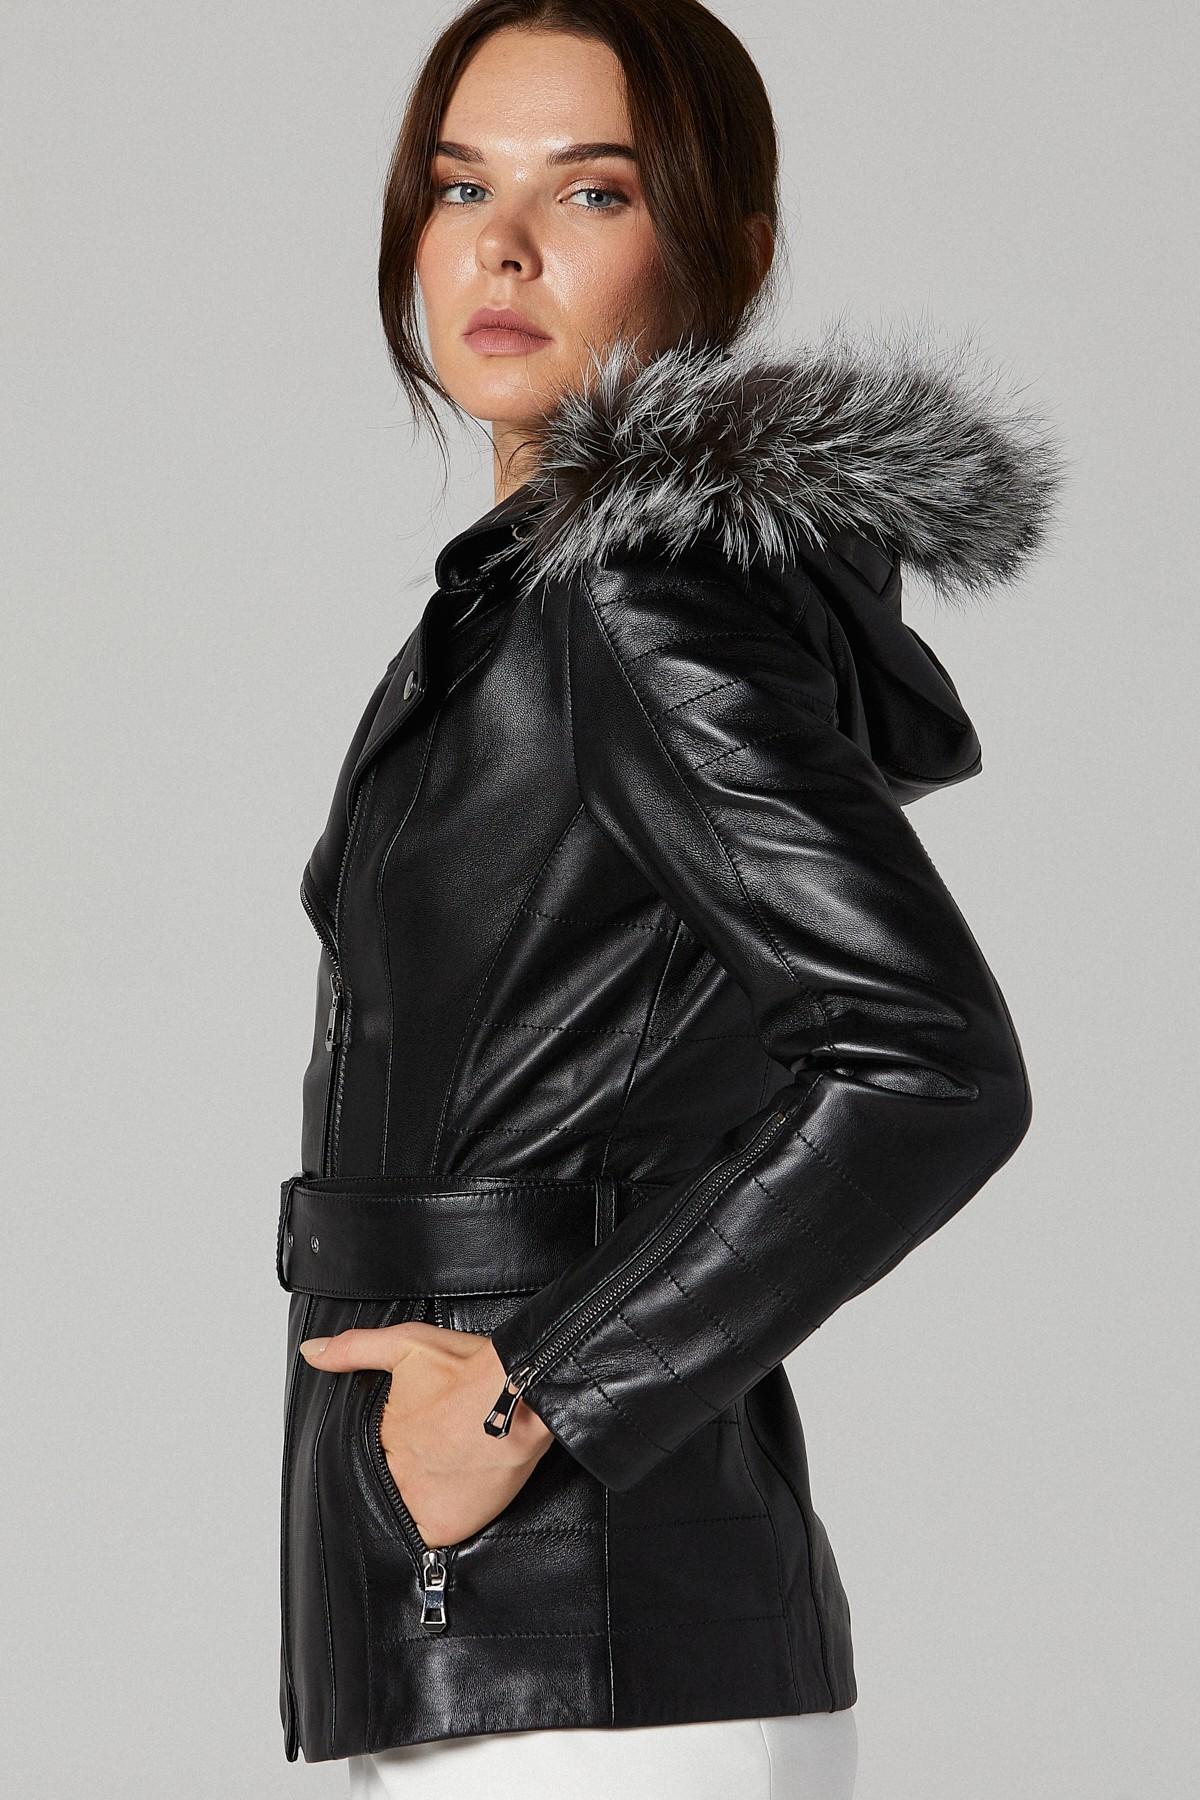 Topshop Ladies Leather Jackets